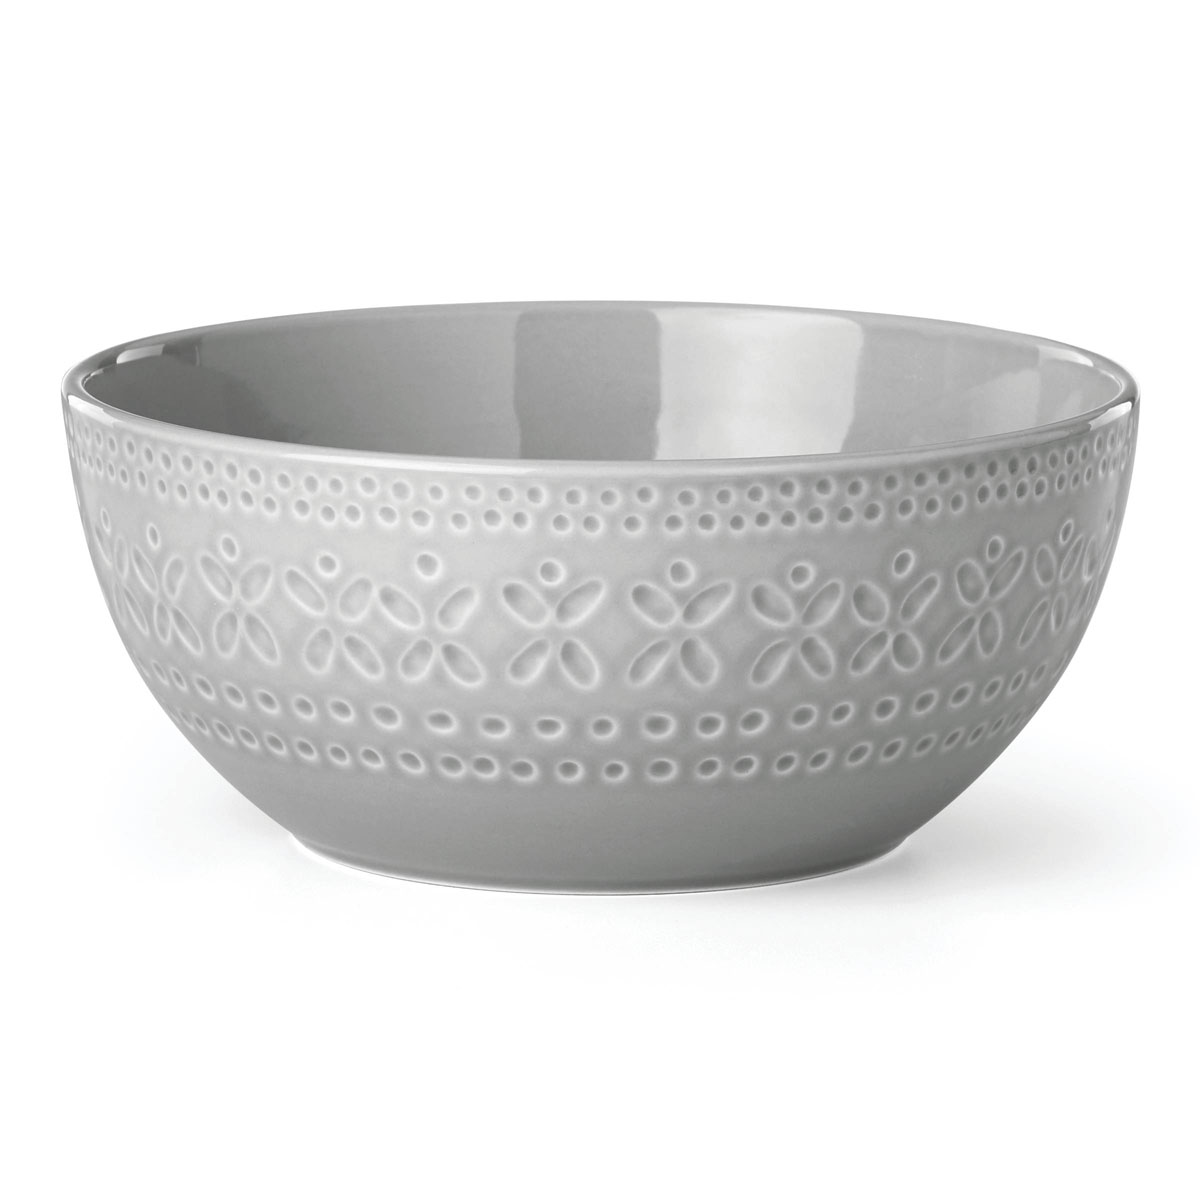 kate spade new york Lenox Stoneware Willow Drive Grey Serve Bowl